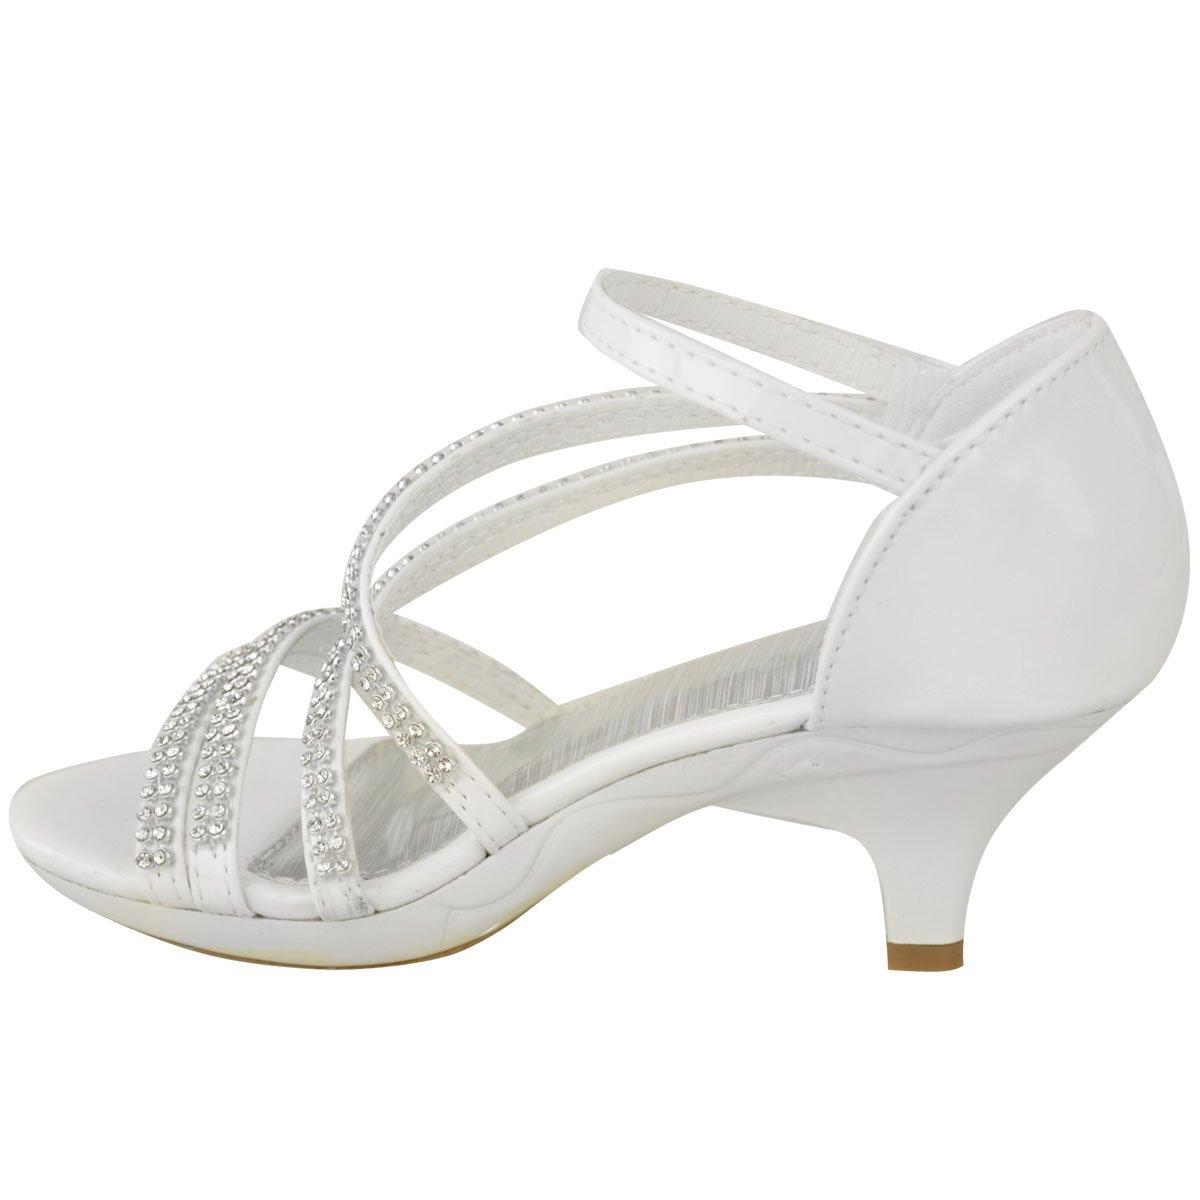 Fashion Thirsty Girls Kids Heeled Wedding Bridesmaid Diamante Sandals Party Shoes Size